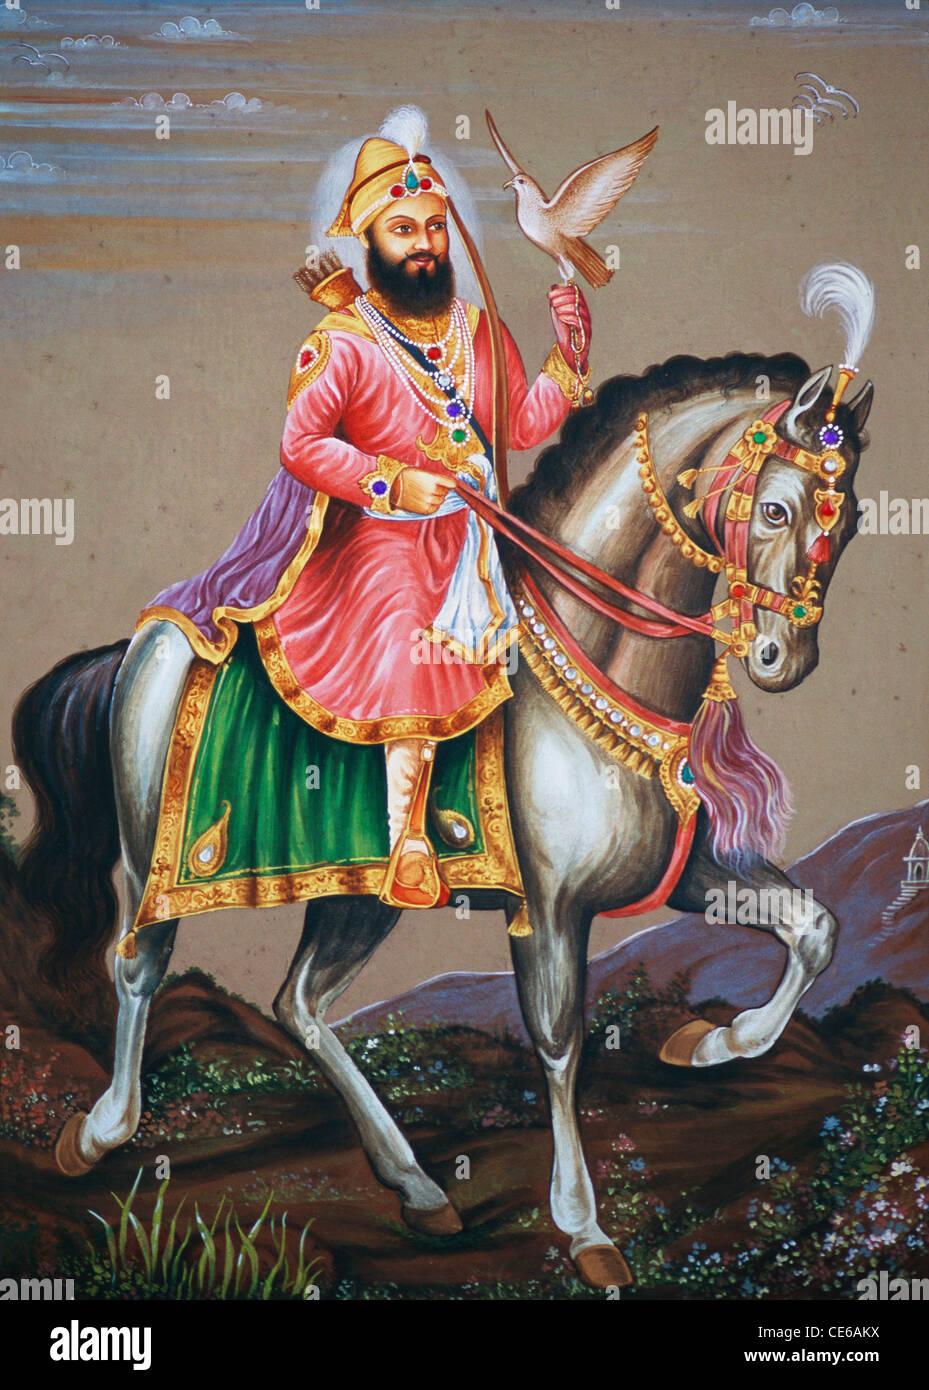 Guru Govind Singh riding on horse miniature painting on paper Stock Photo